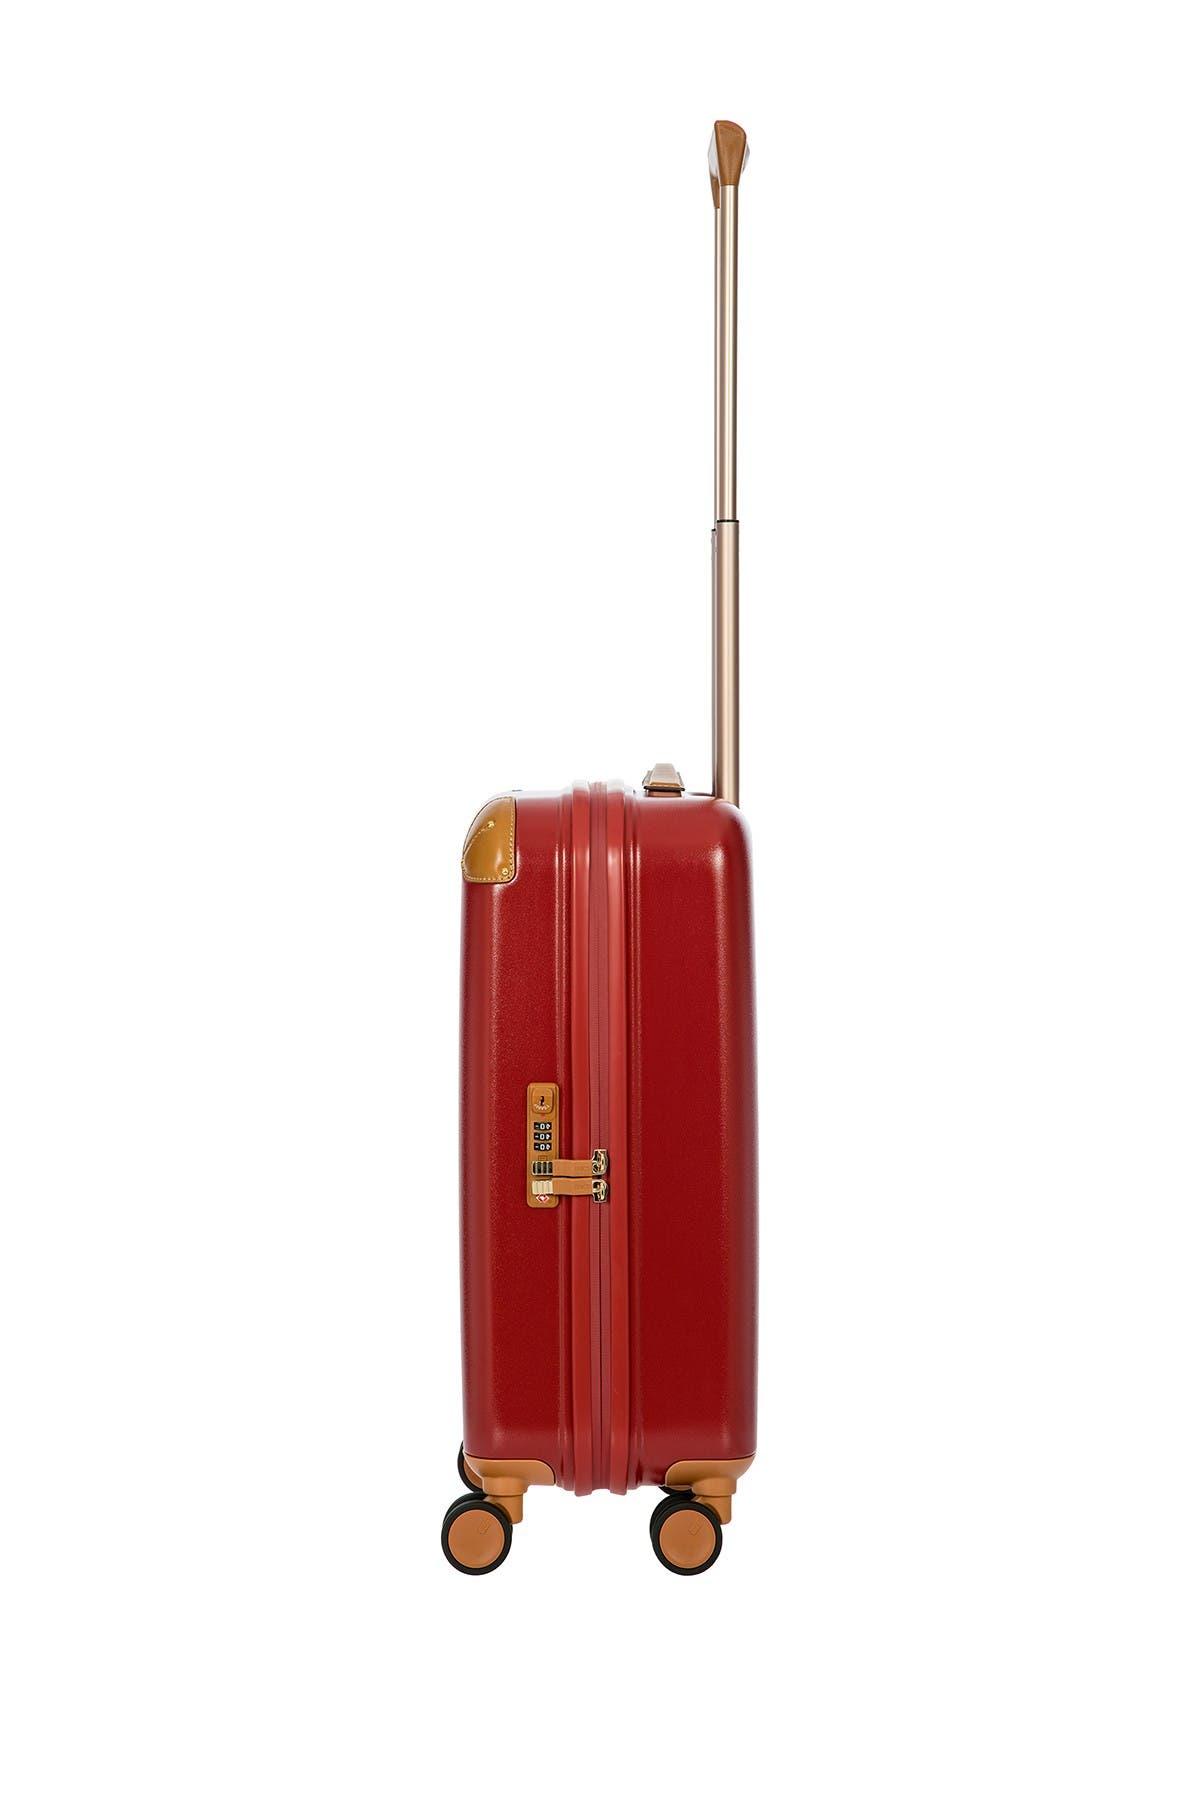 "Image of Bric's Luggage Amalfi 21"" Carry-On Spinner Suitcase"